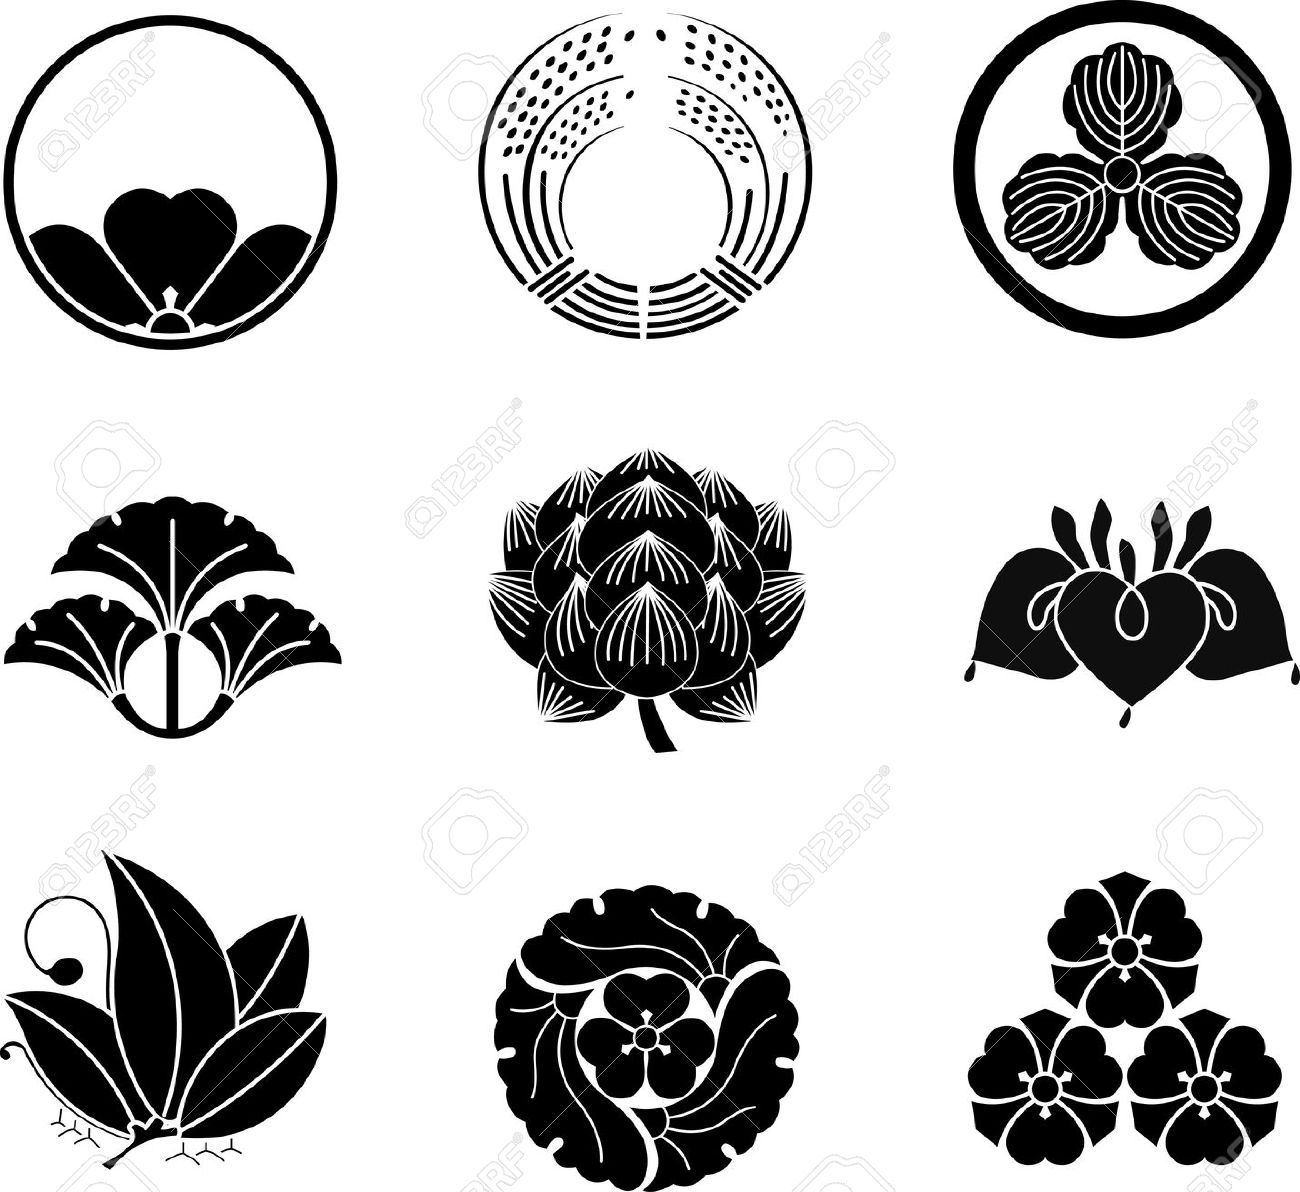 japanese lotus flower - Google Search | Art | Pinterest | Blossoms ...